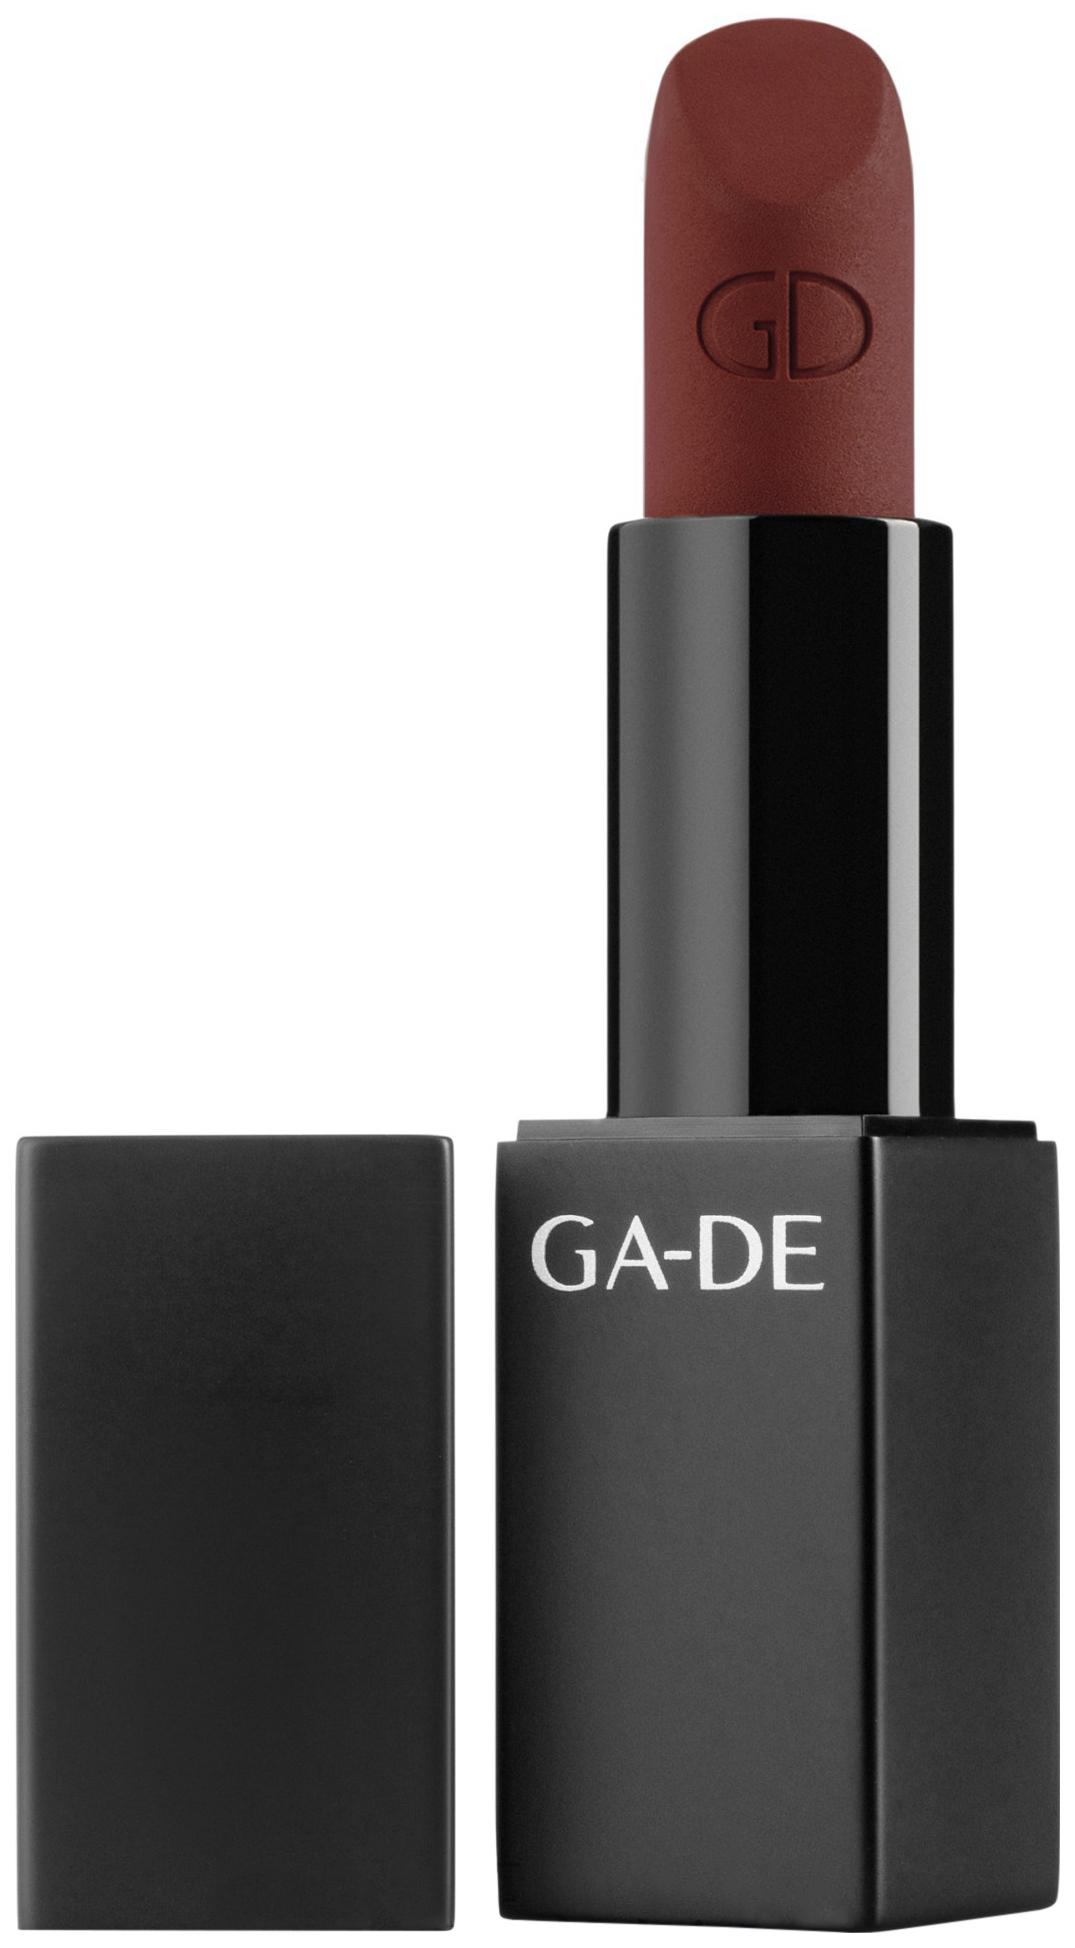 Помада Ga-De Velveteen Pure Matte Lipstick 756 Baroque Rose 4 г